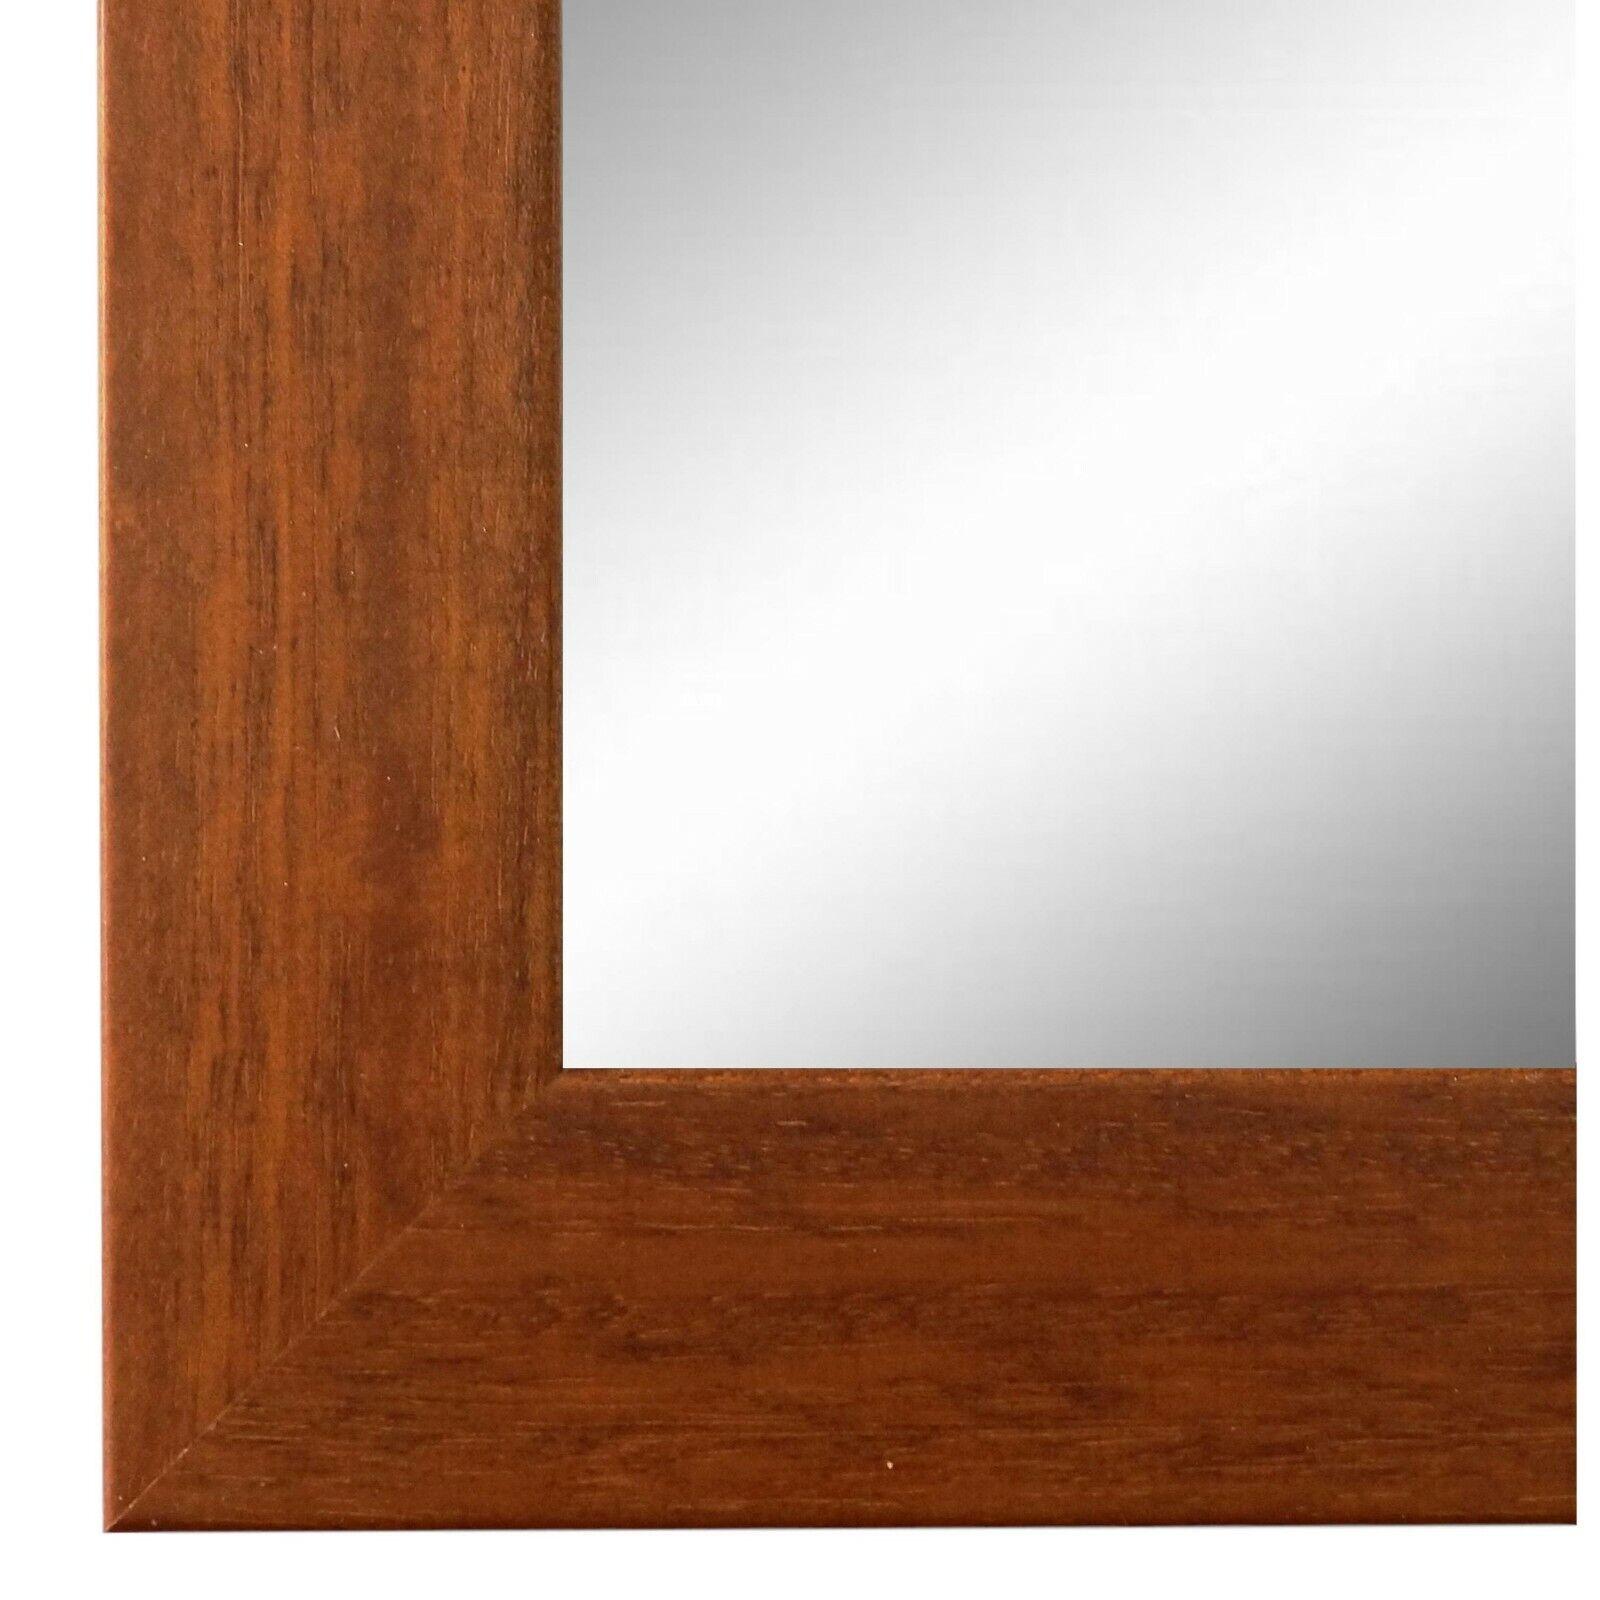 Spiegel Wandspiegel Bad Flur Holz Modern Retro Florenz Braun 4,0 - NEU